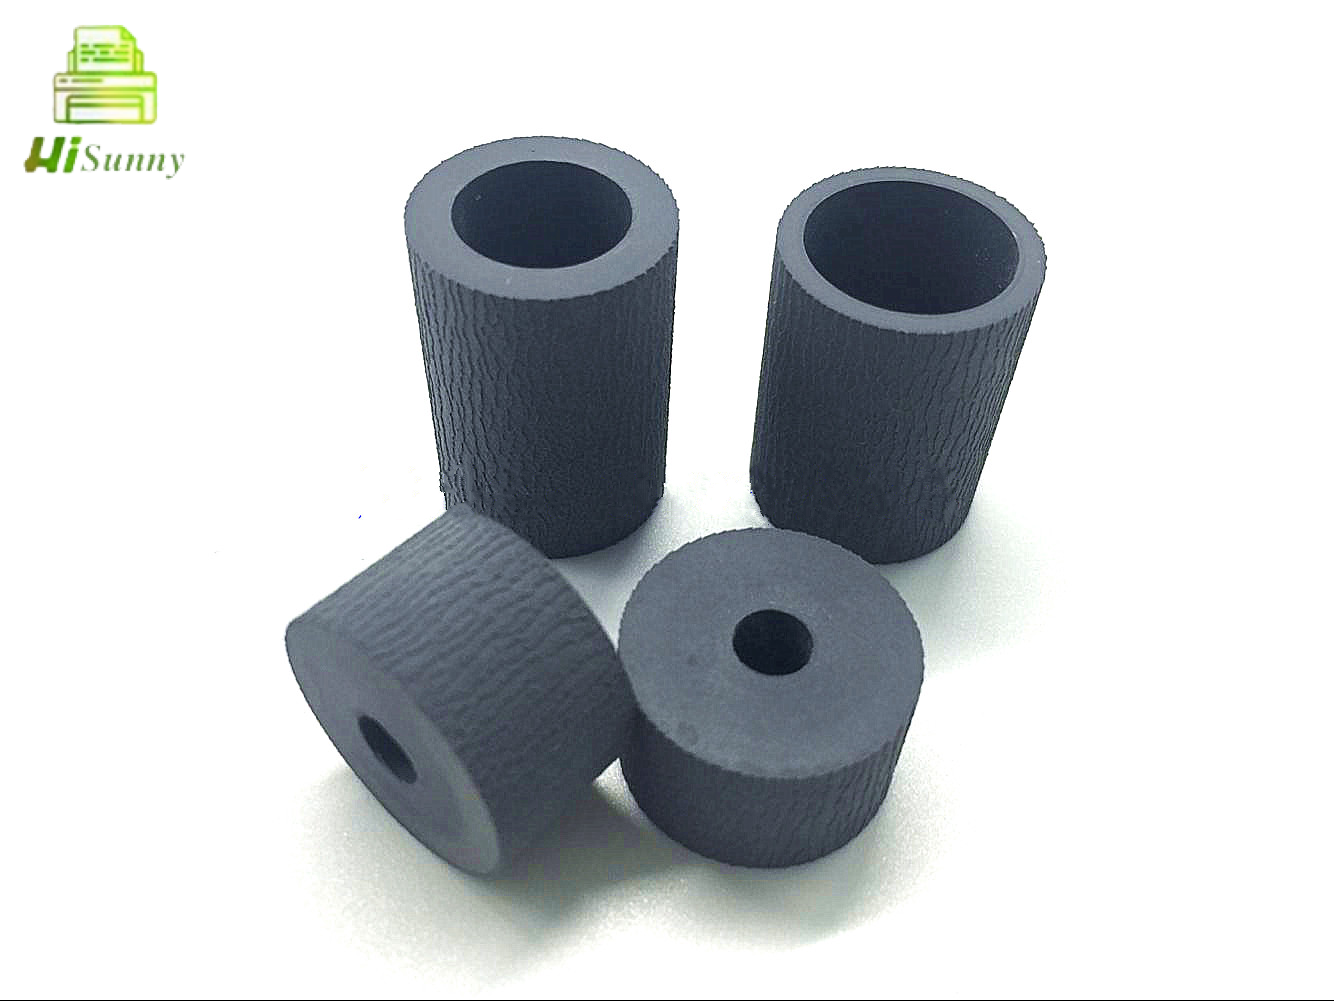 5set compativel novo cilindro de recolhimento de papel pneu de borracha para toshiba e163 182 255